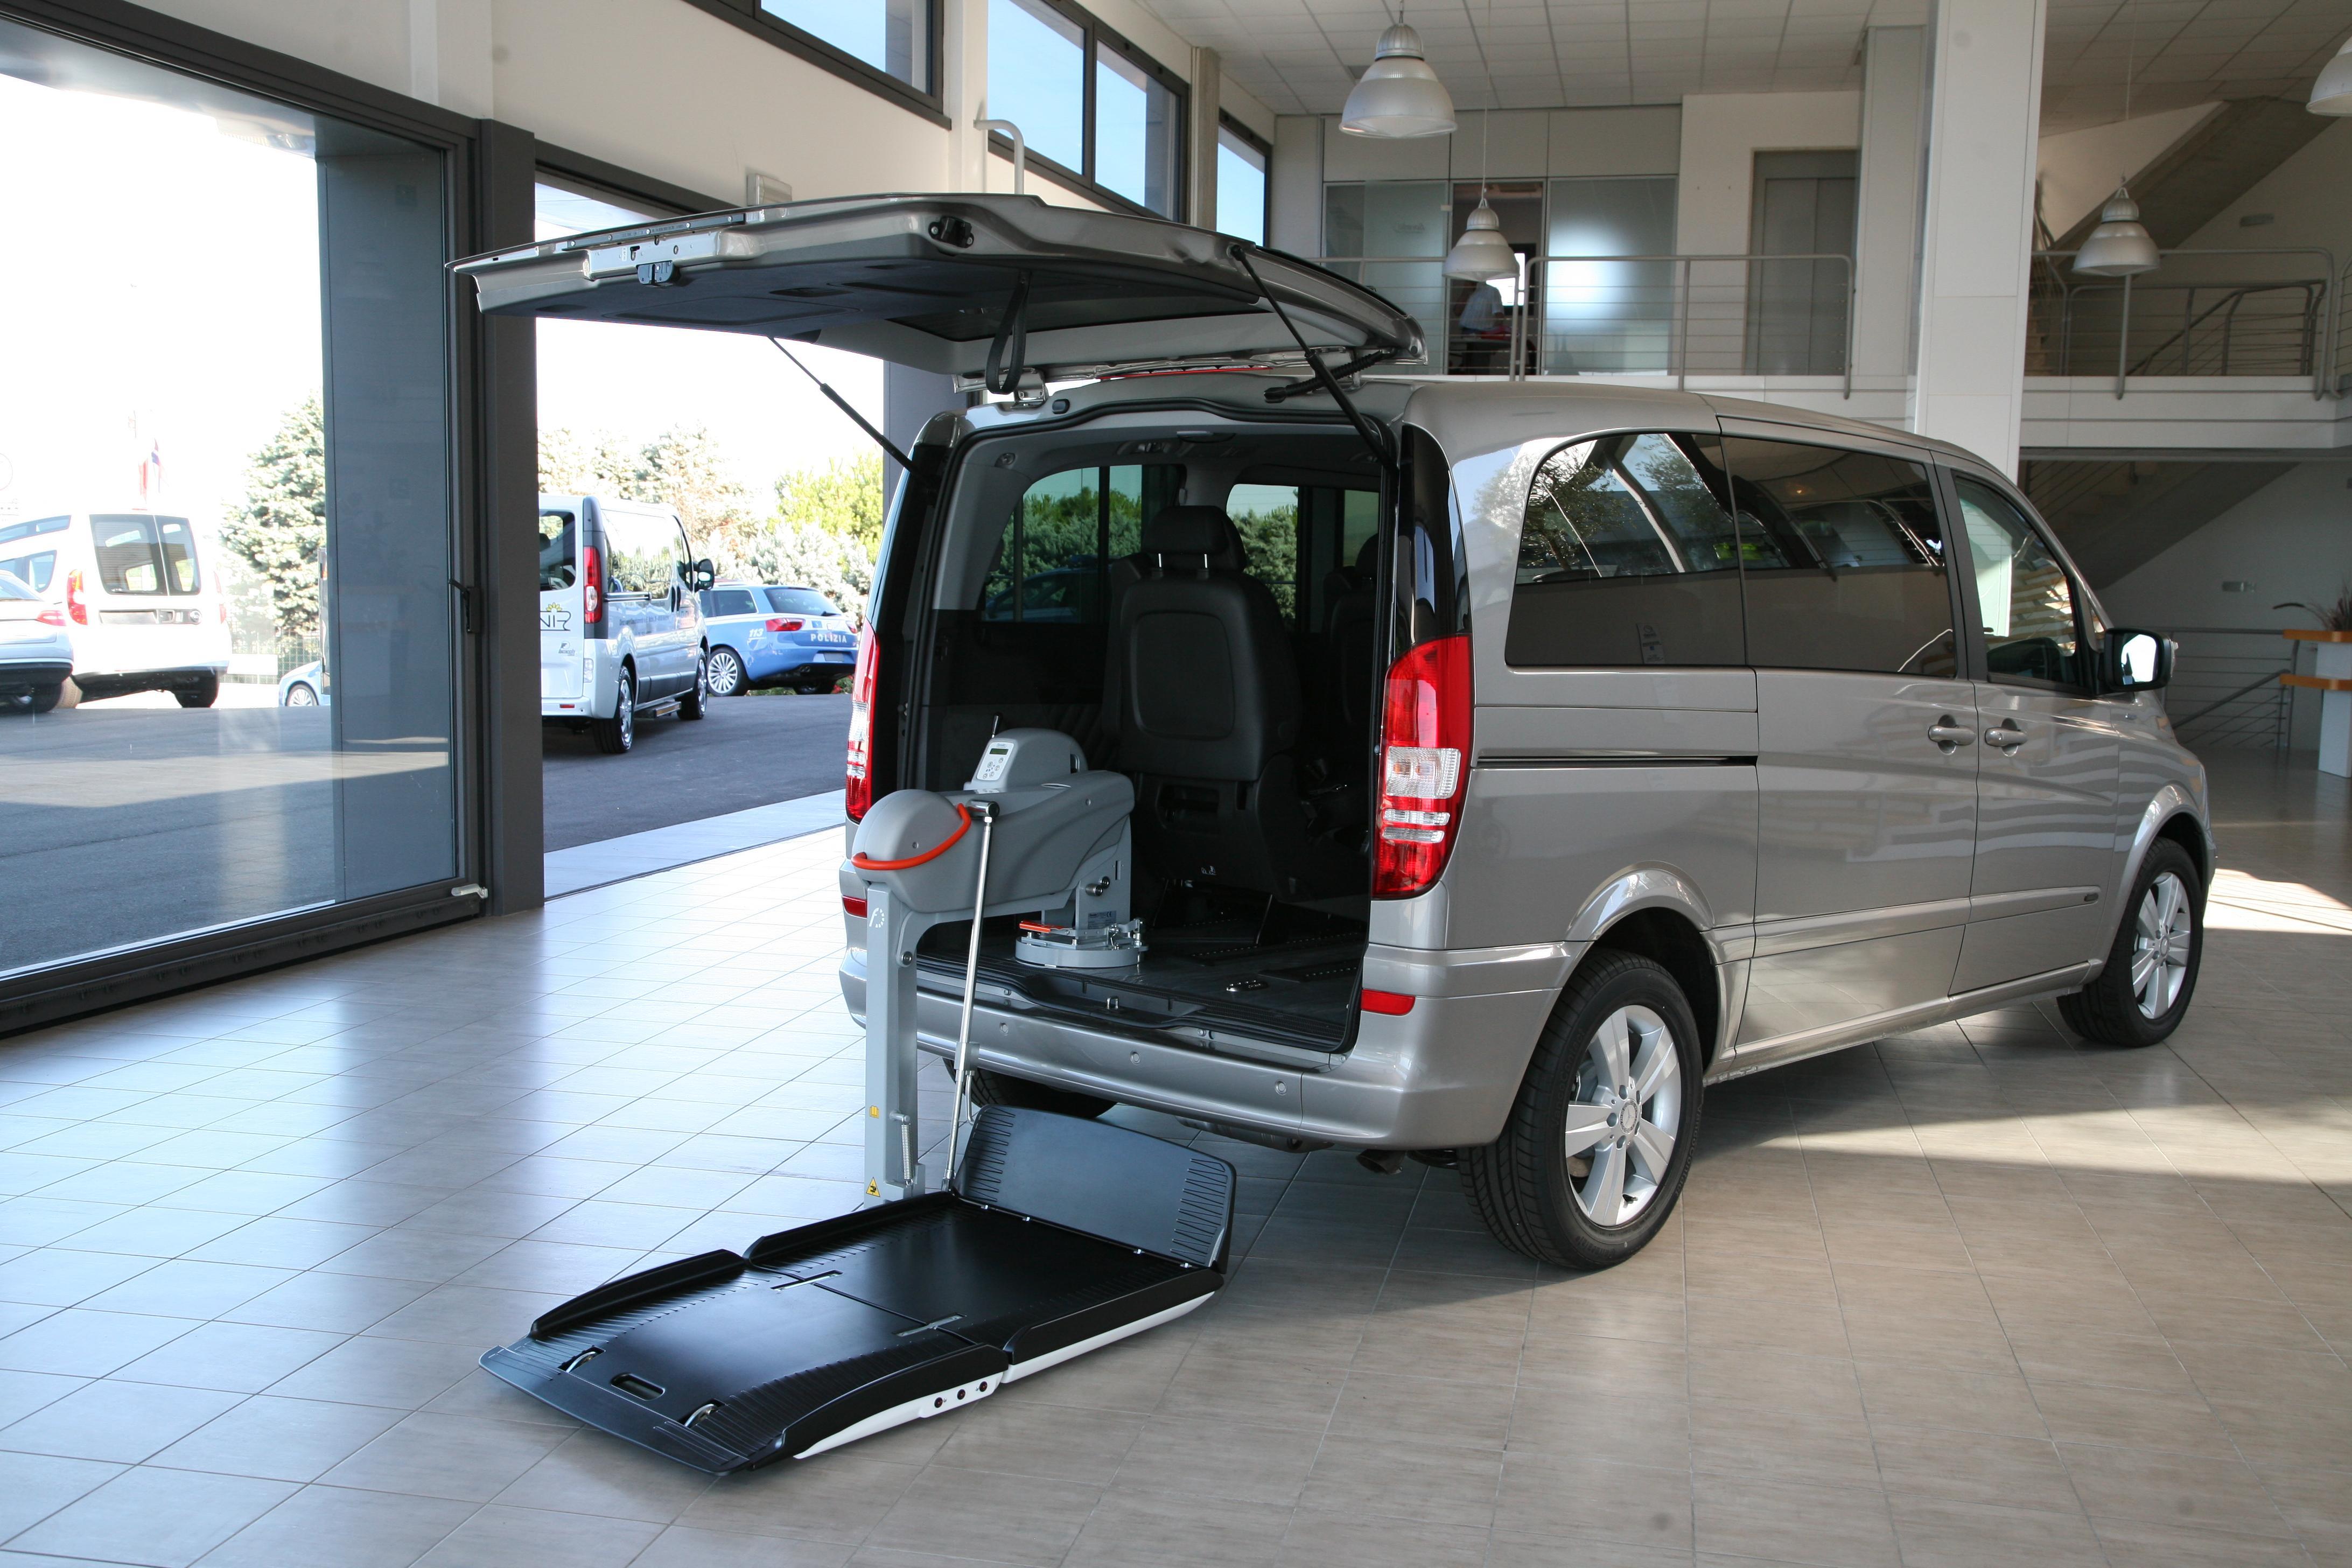 Viano Mobility